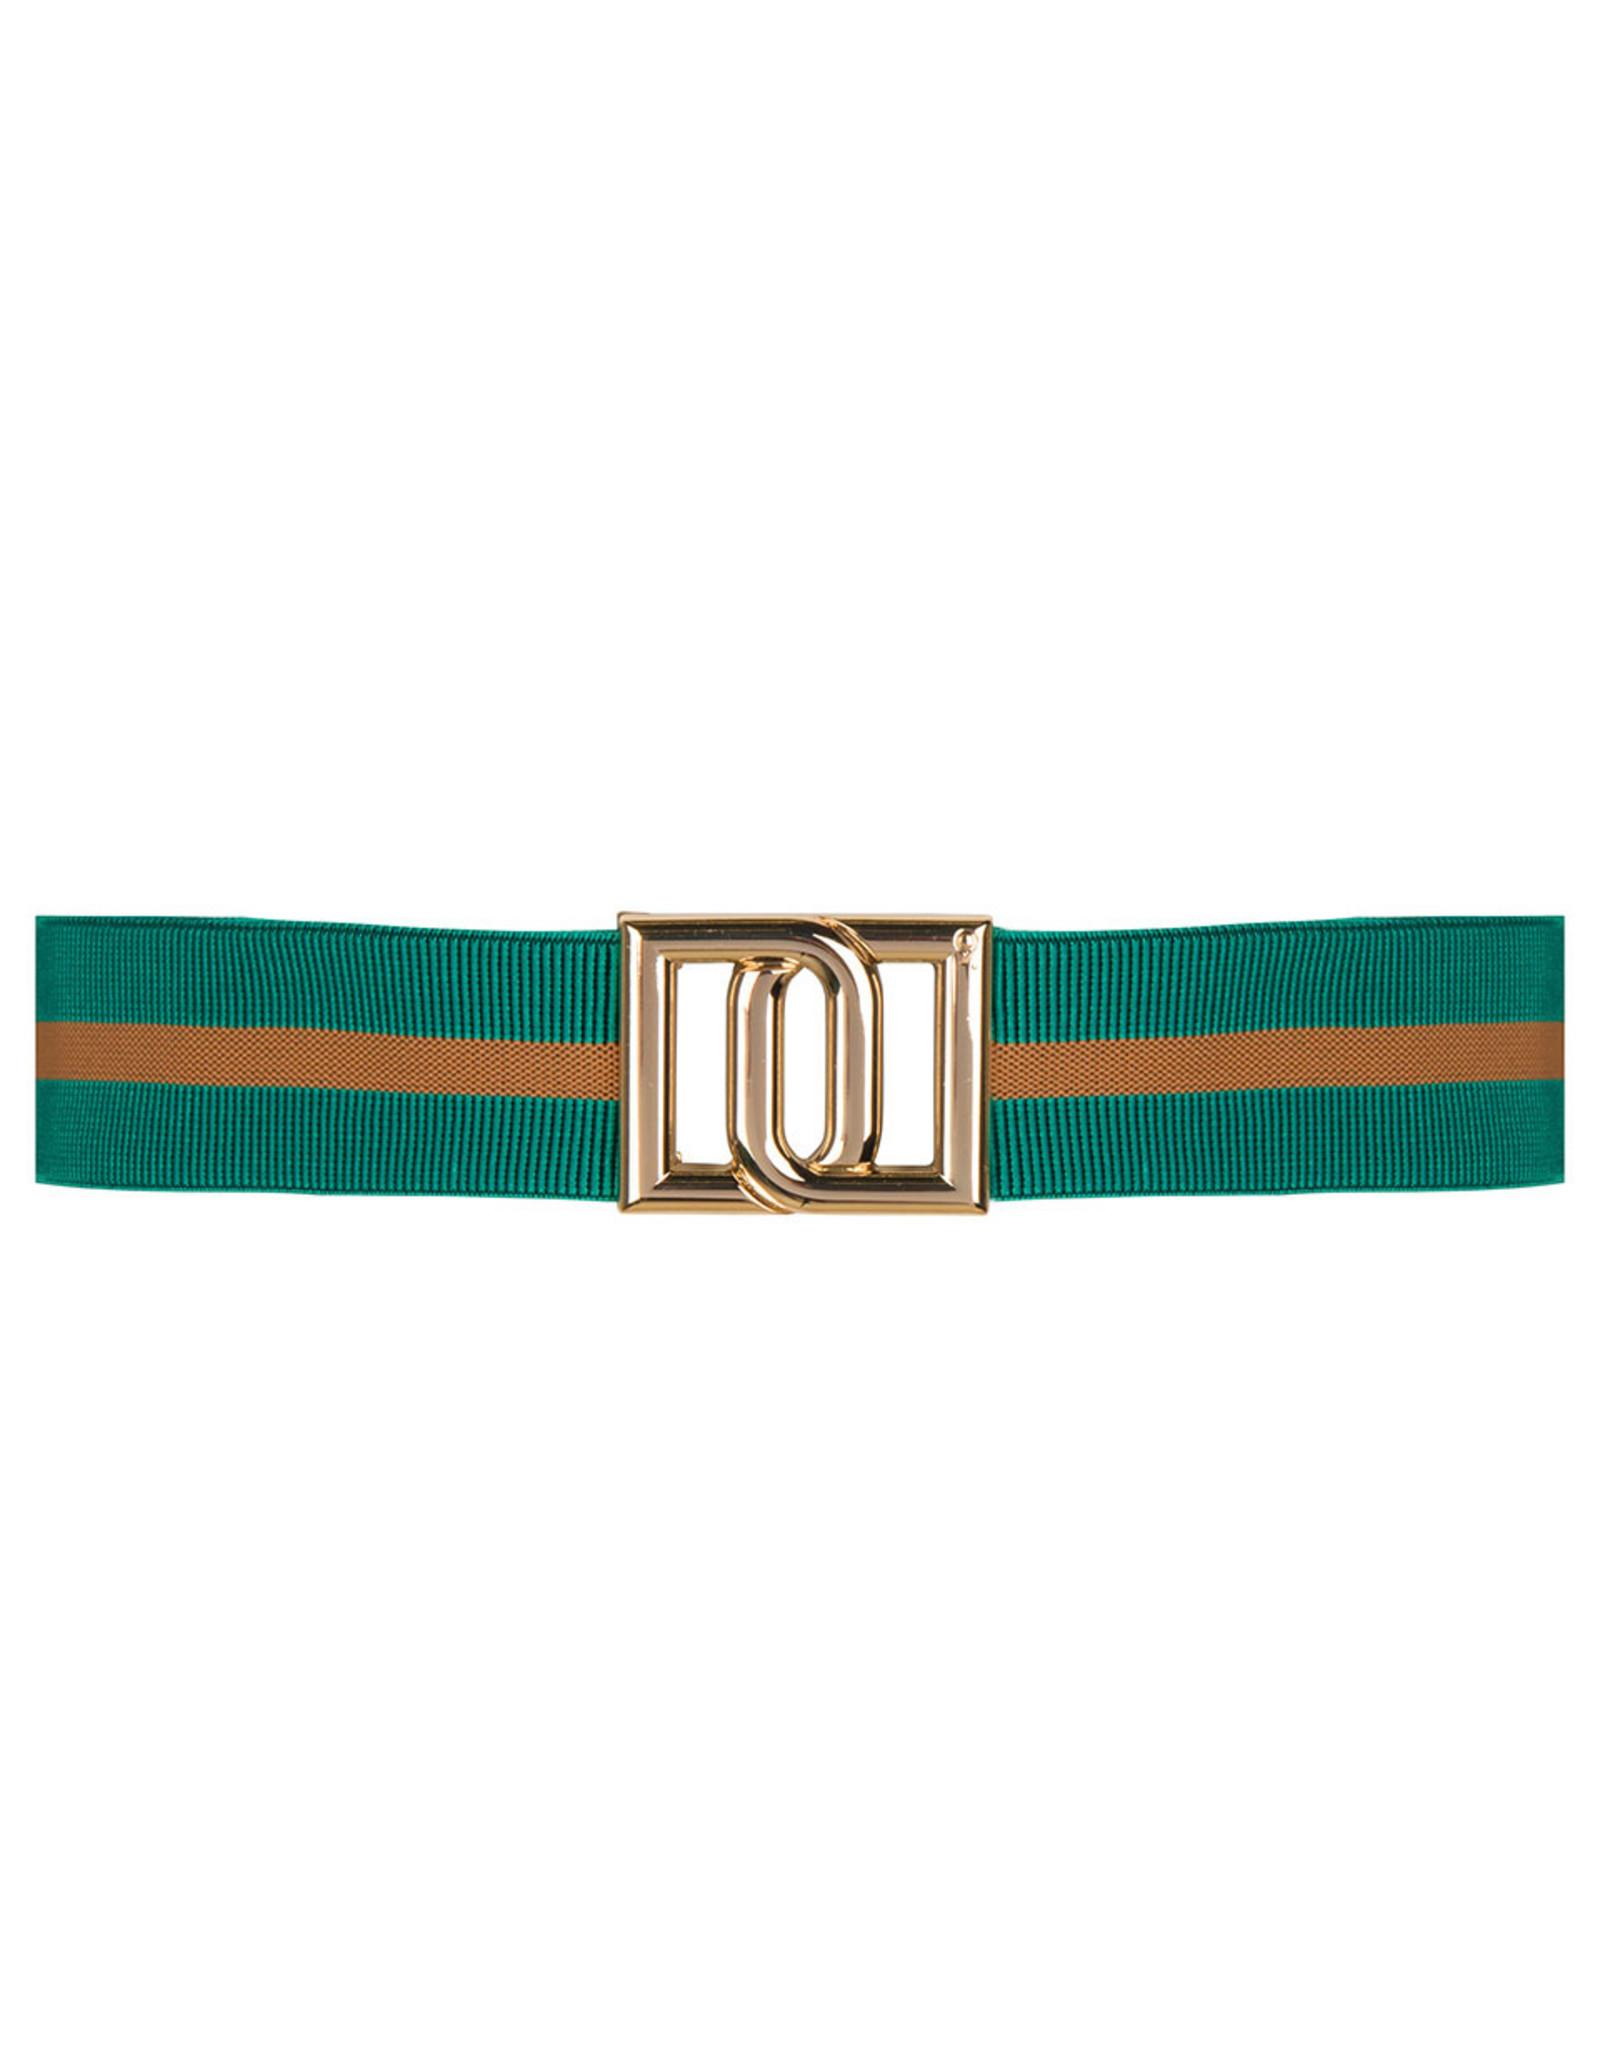 Dante 6 Monogram Belt Emerald Green